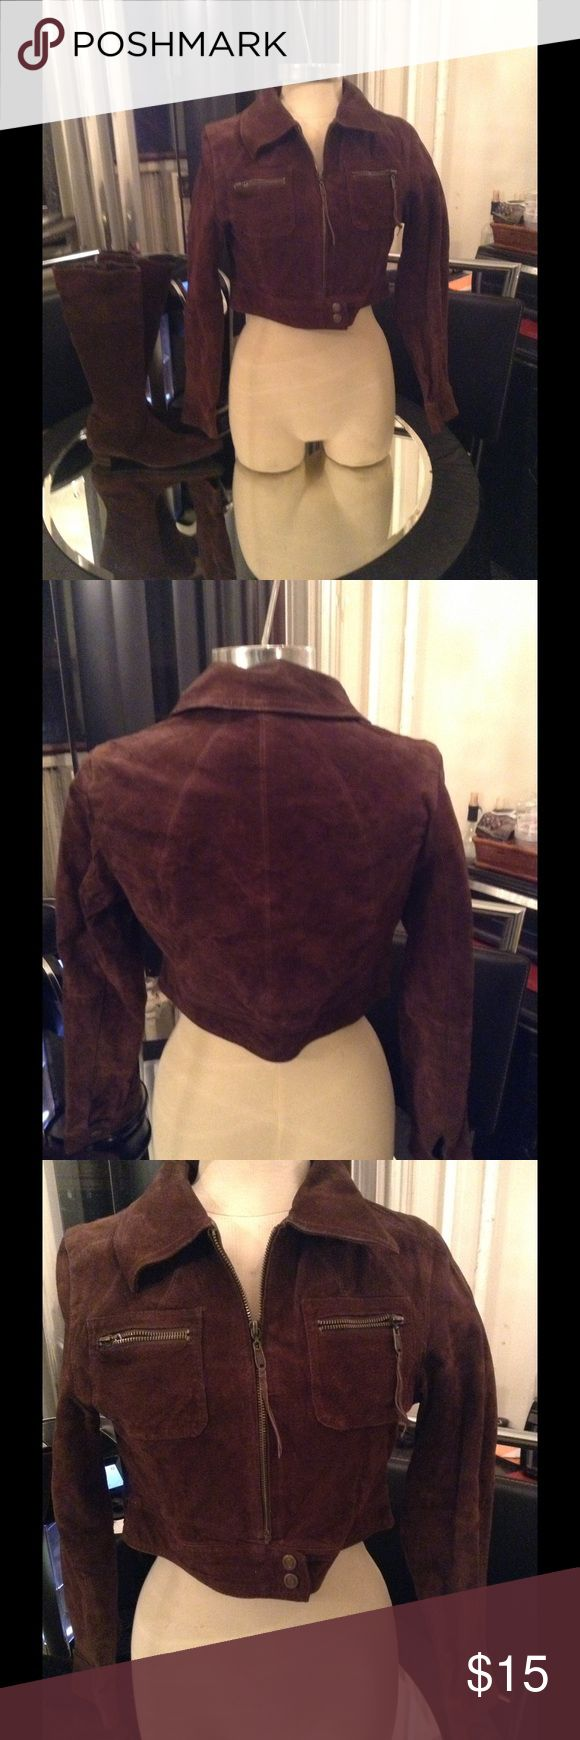 Brown suede Jacket NWT great jacket helium Jackets & Coats